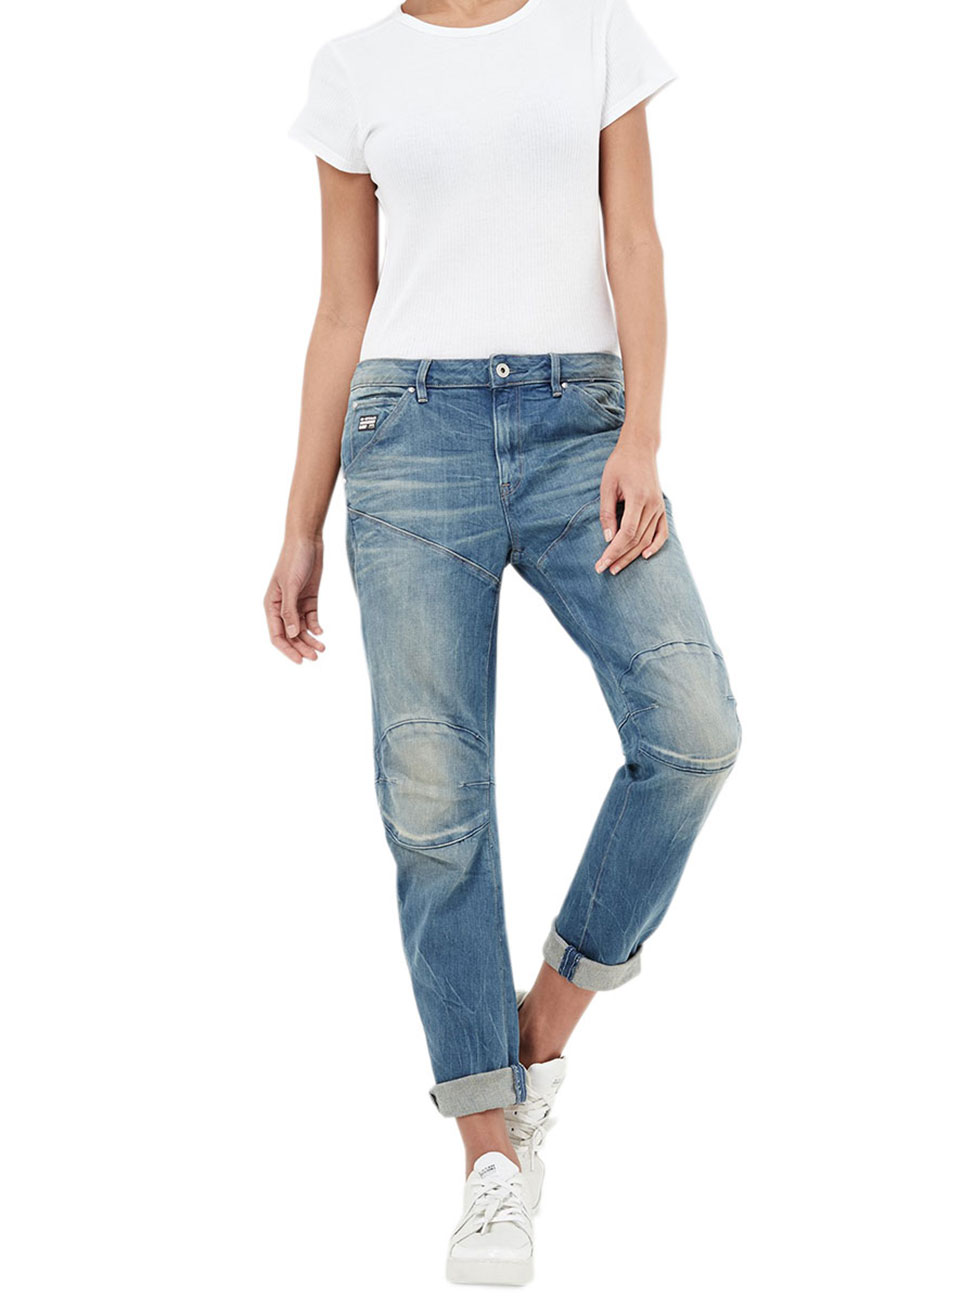 g star damen jeans 5620 elwood 3d low boyfriend light aged kaufen jeans direct de. Black Bedroom Furniture Sets. Home Design Ideas